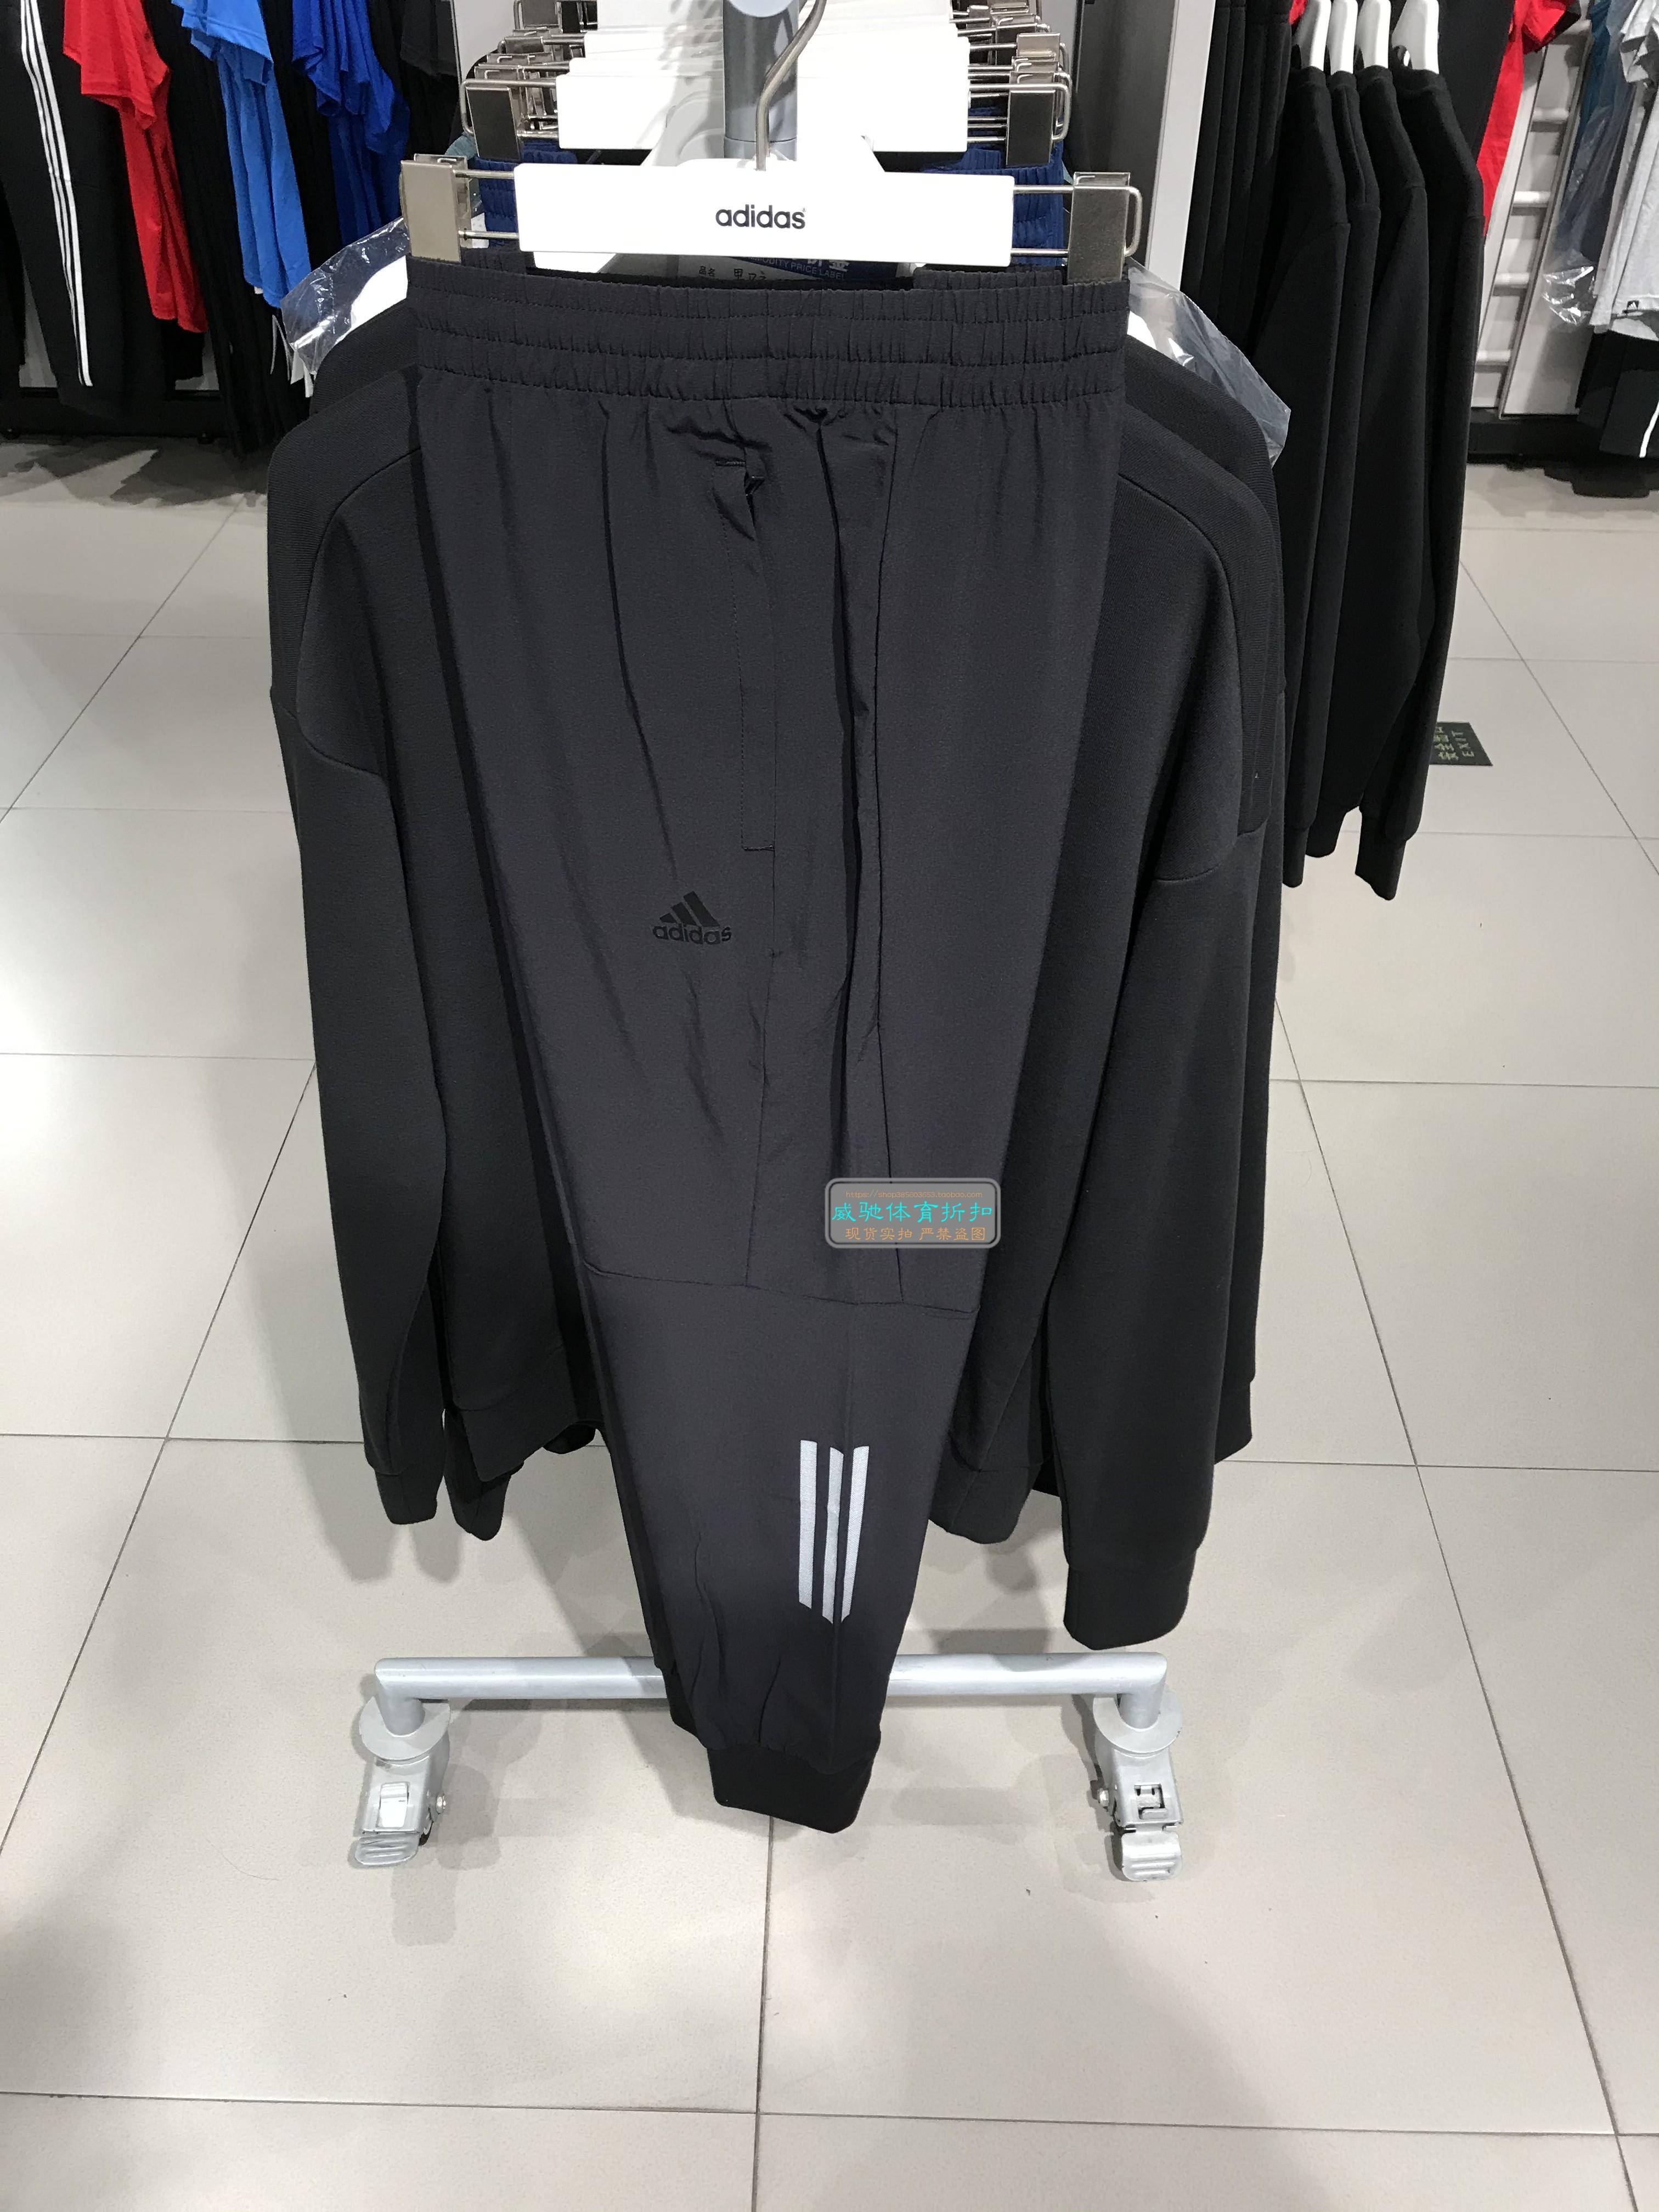 Adidas阿迪达斯愛迪達男裤春季运动休闲速干收口小脚长裤 EH3771 EH3772